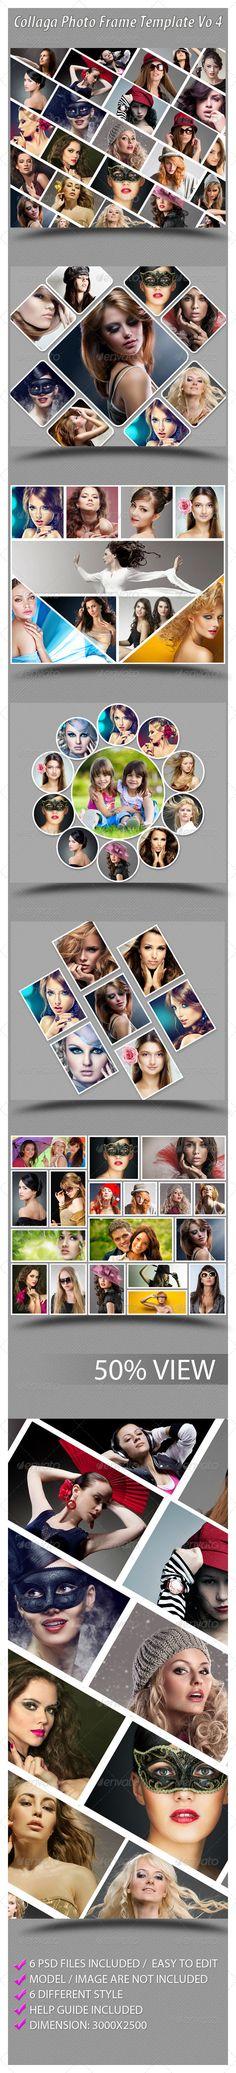 Collaga Photo Template Vo 4 #smart #product Download : https://graphicriver.net/item/collaga-photo-template-vo-4/6540292?ref=pxcr